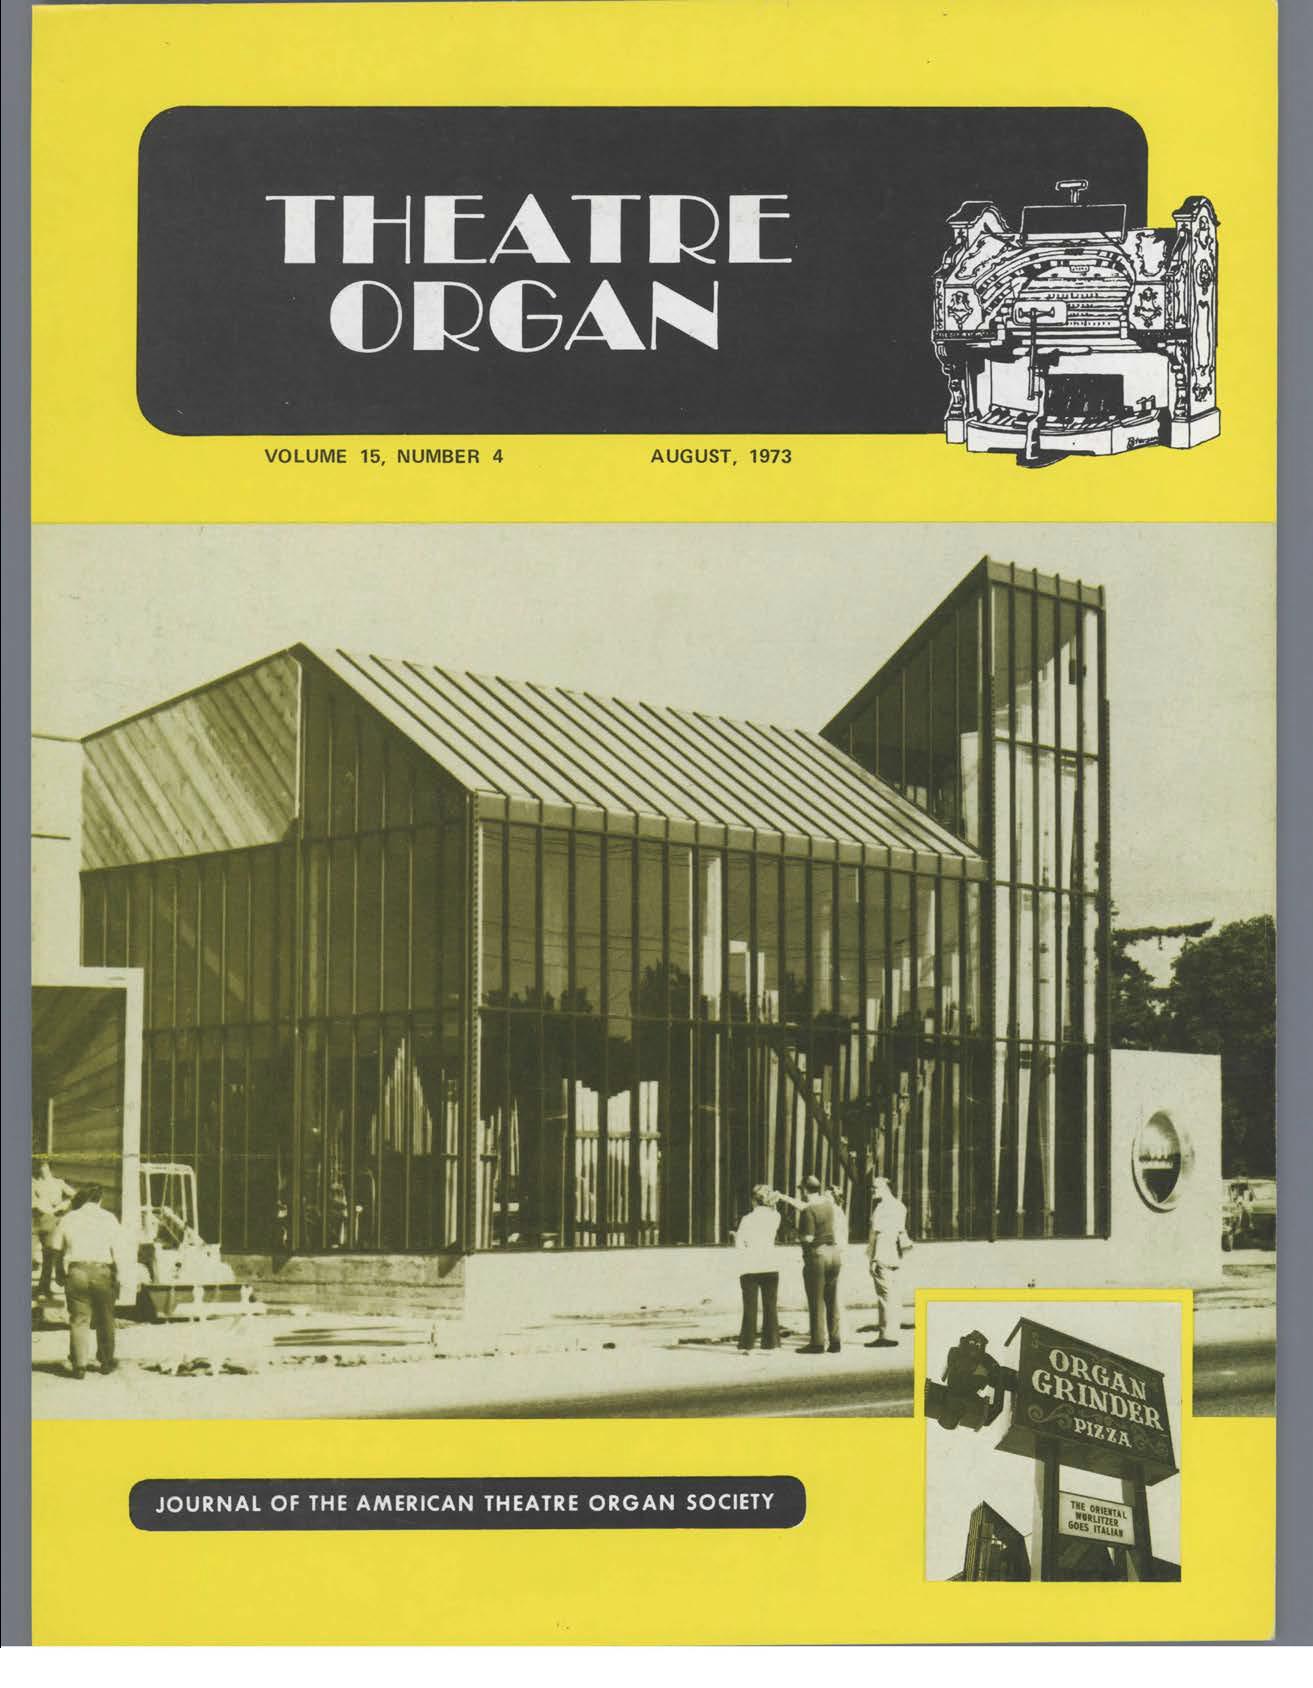 Theatre Organ, August 1973, Volume 15, Number 4